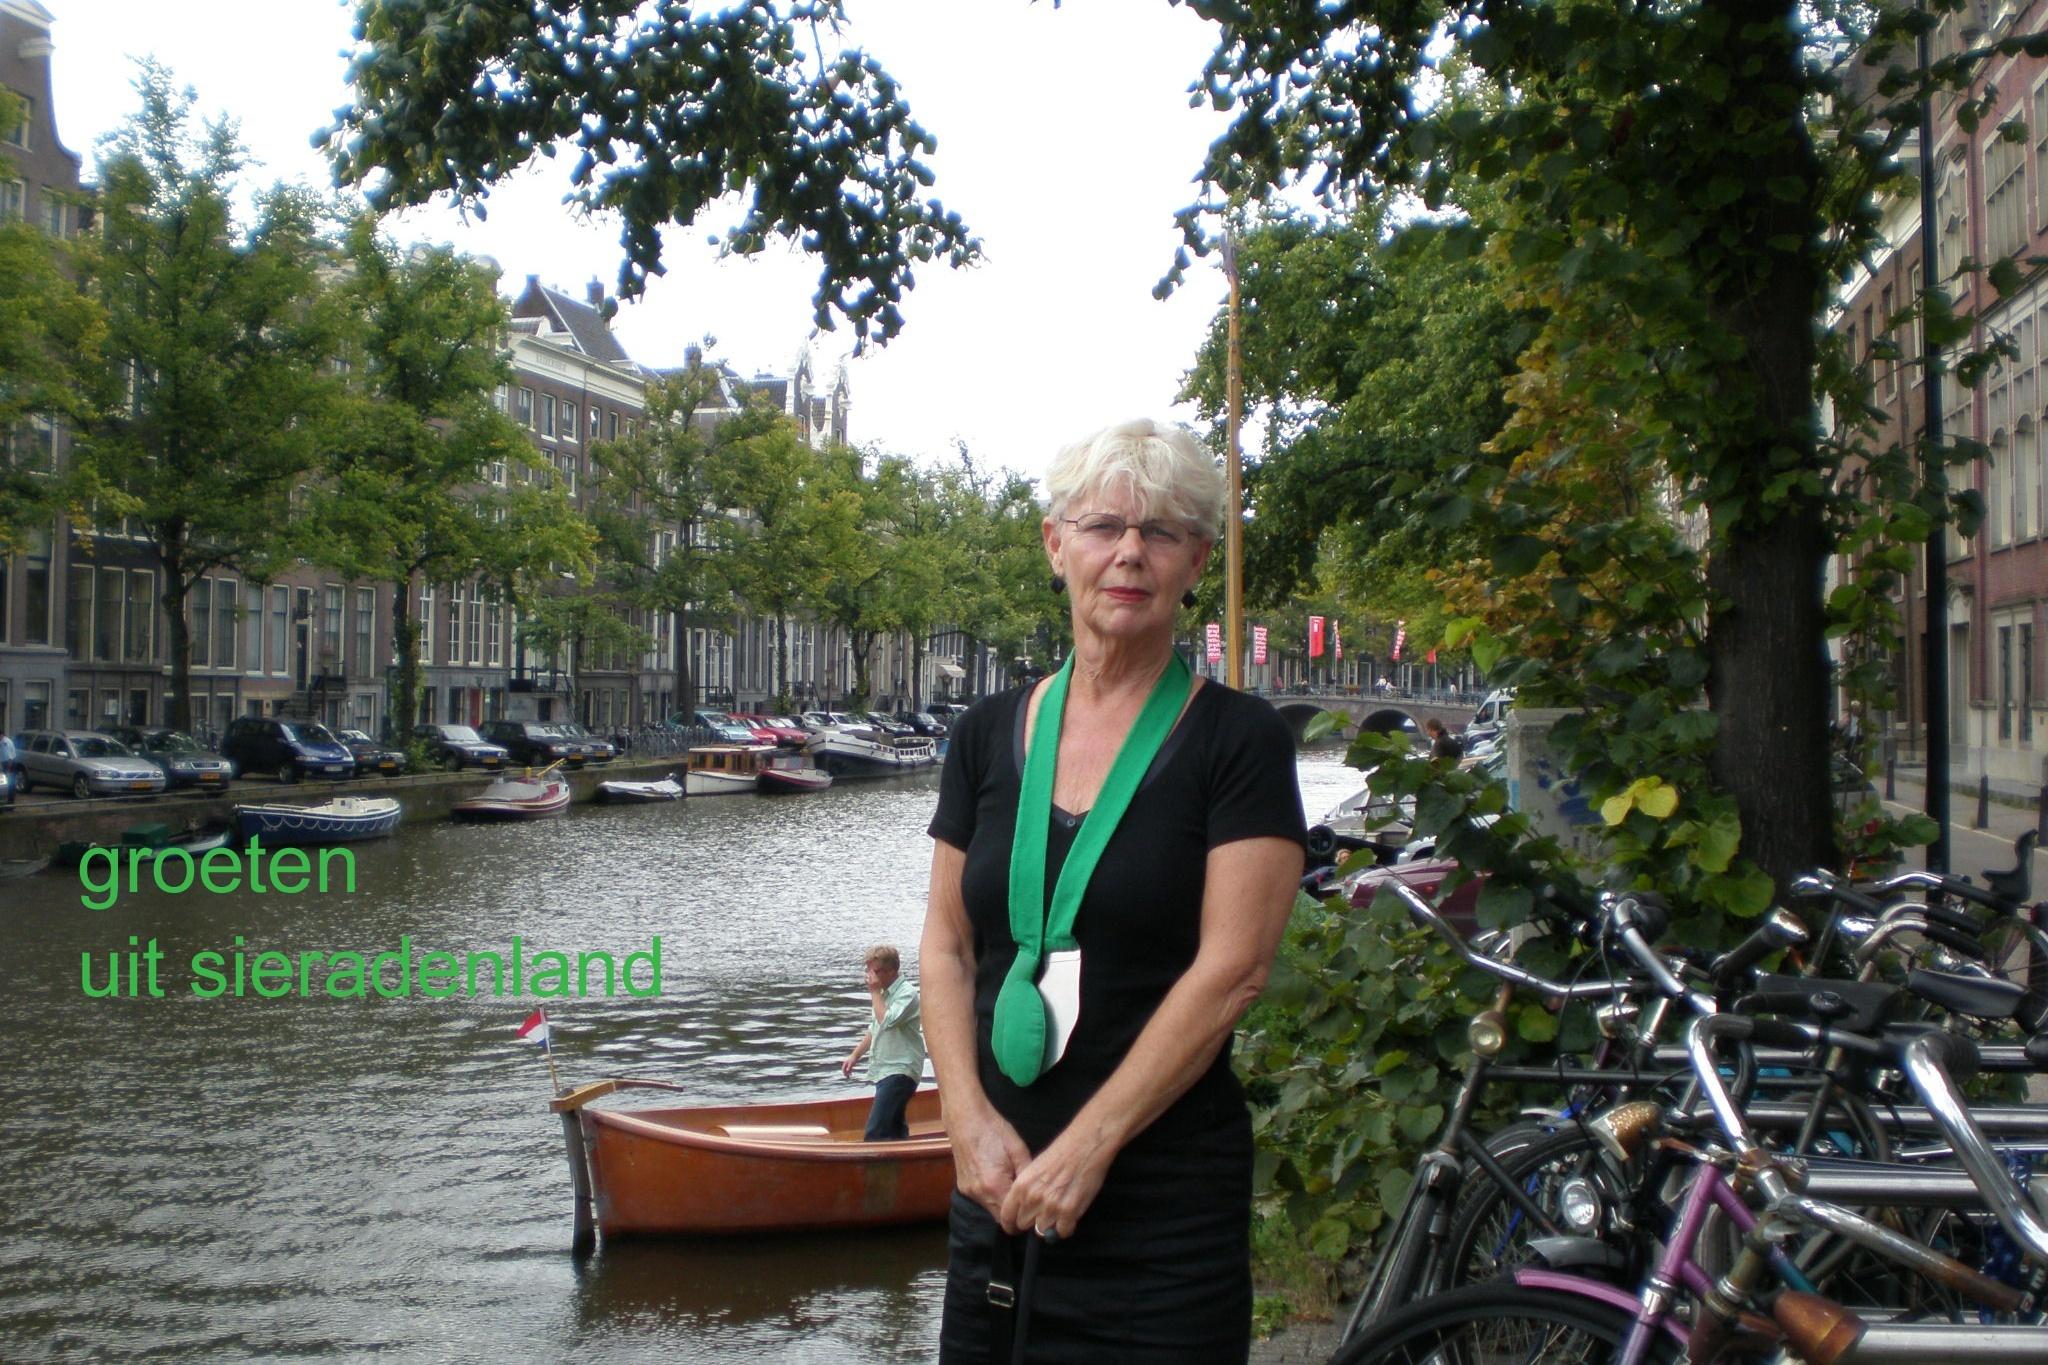 Claartje Keur, Zelfportret met halssieraad van Ineke Heerkens, Amsterdam, 17 augustus 2008. Foto Claartje Keur